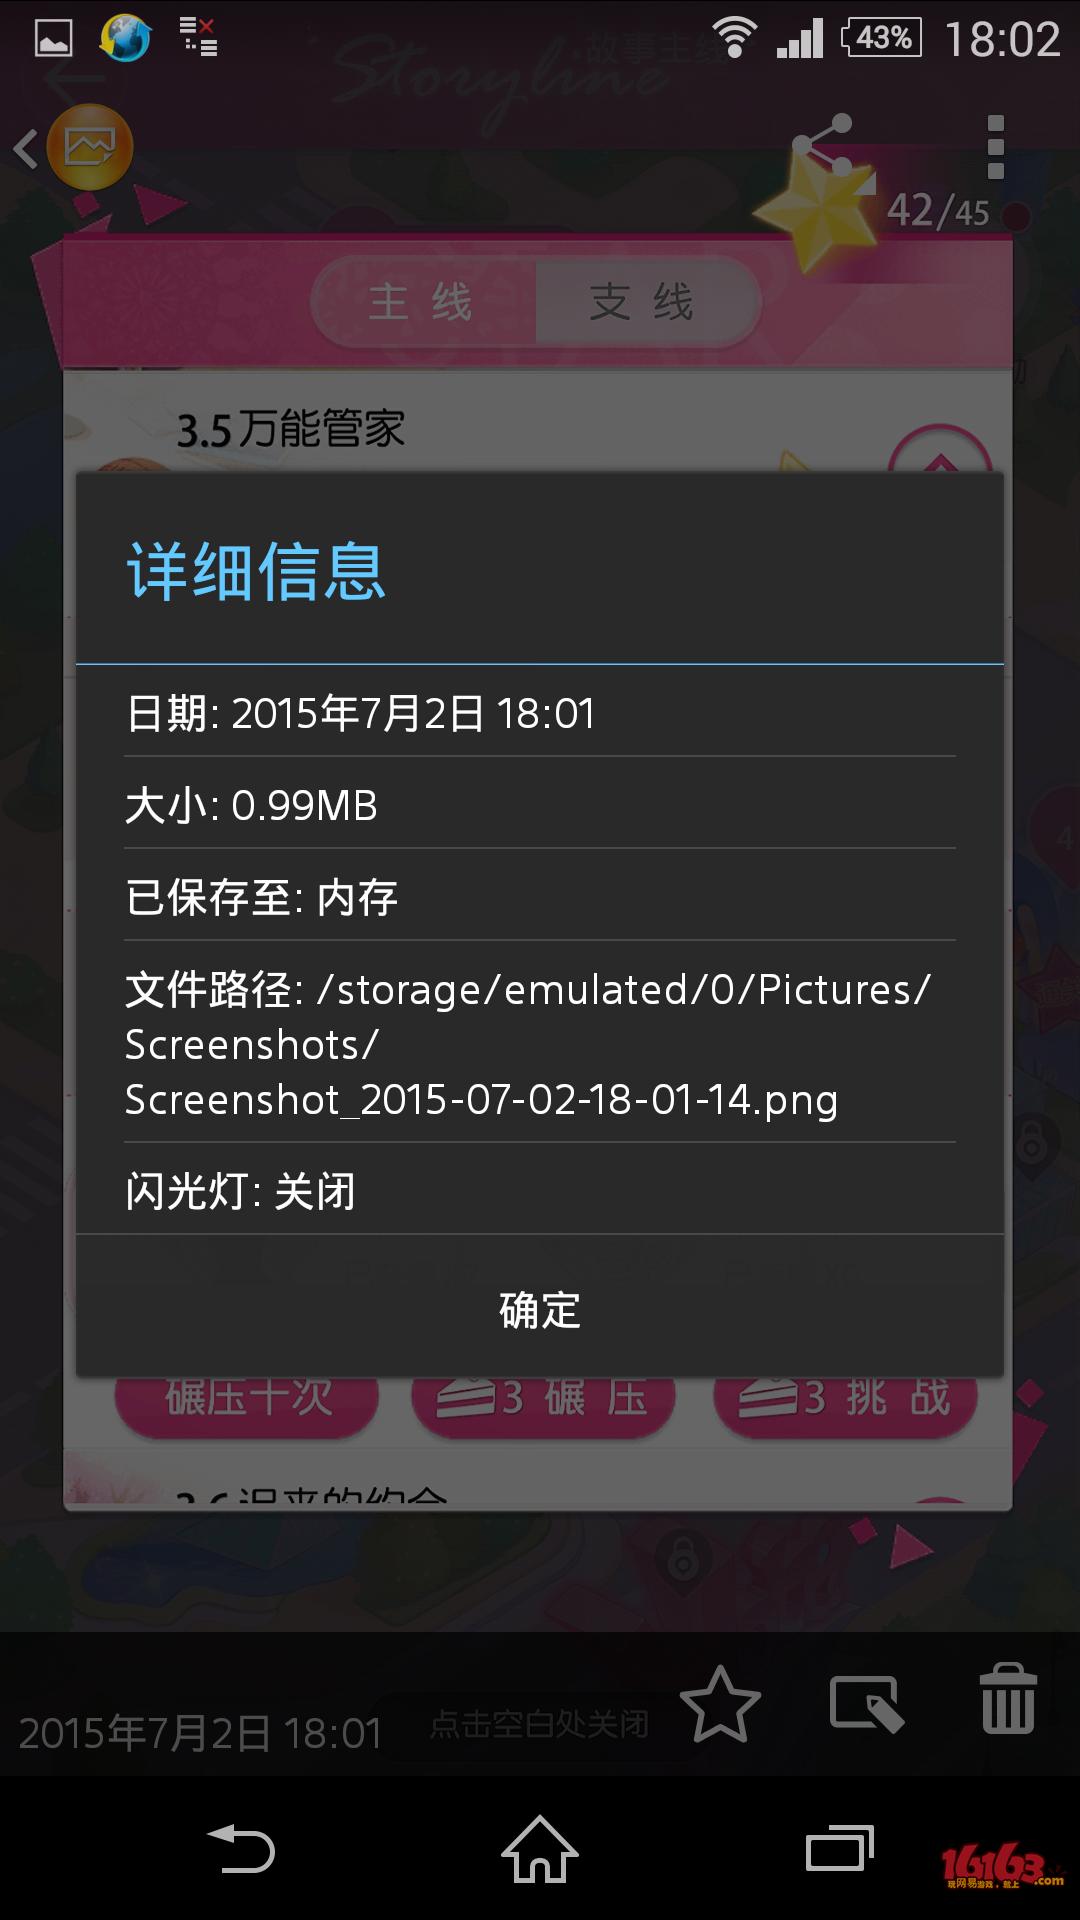 Screenshot_2015-07-02-18-02-23.png